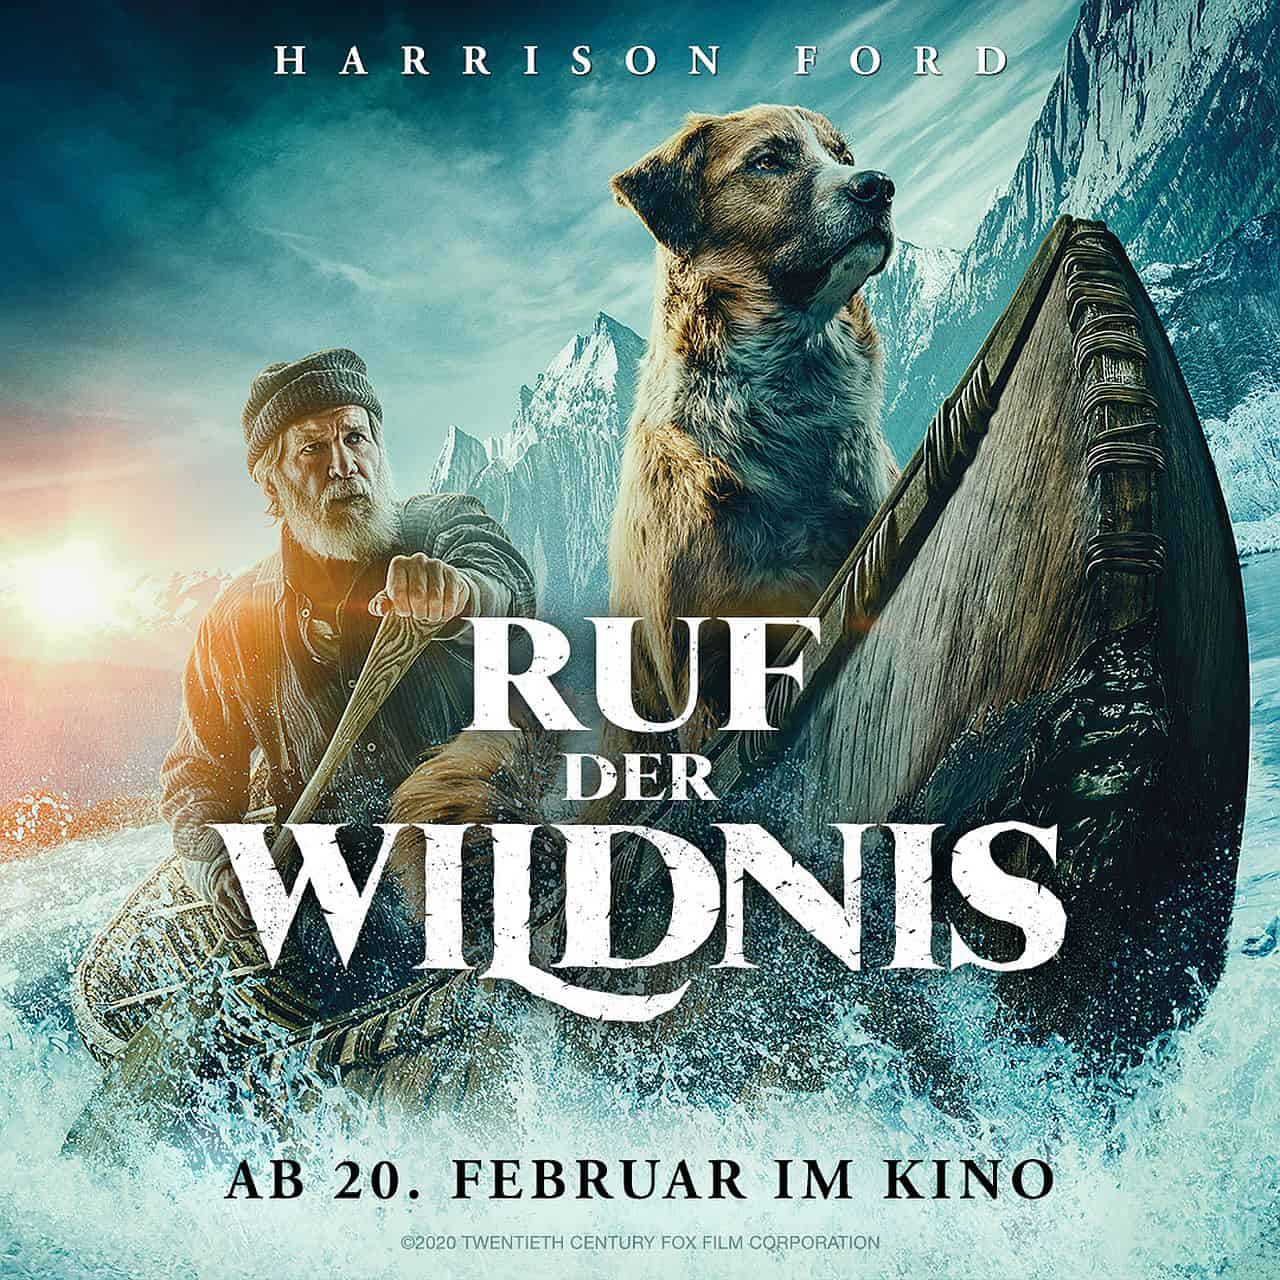 Filmkritik: Ruf der Wildnis